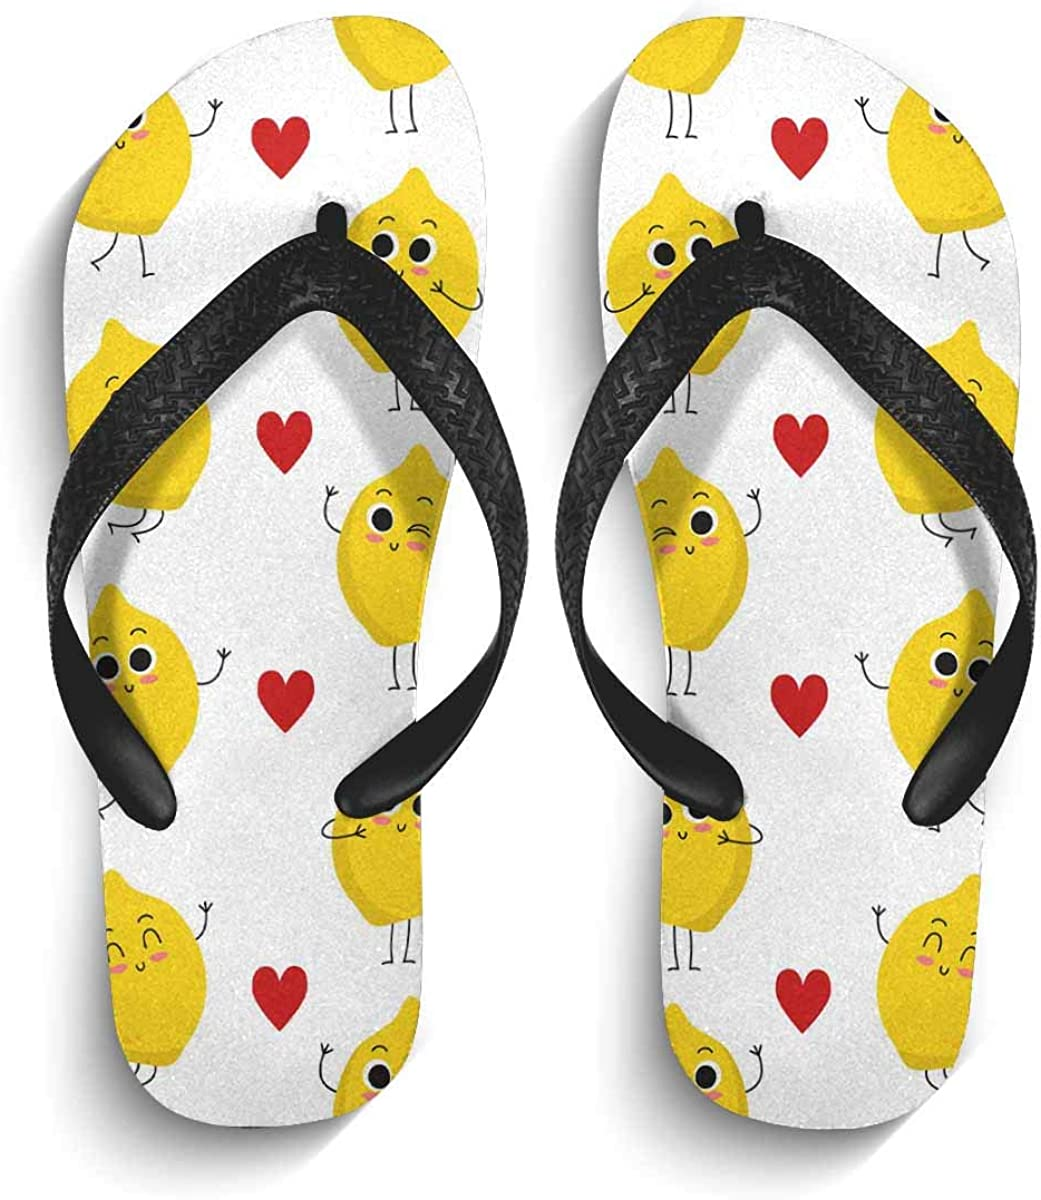 InterestPrint Men's Flip Flops Black Straps Cute Lemon Heart Casual Thongs Sandals for Beach Home M